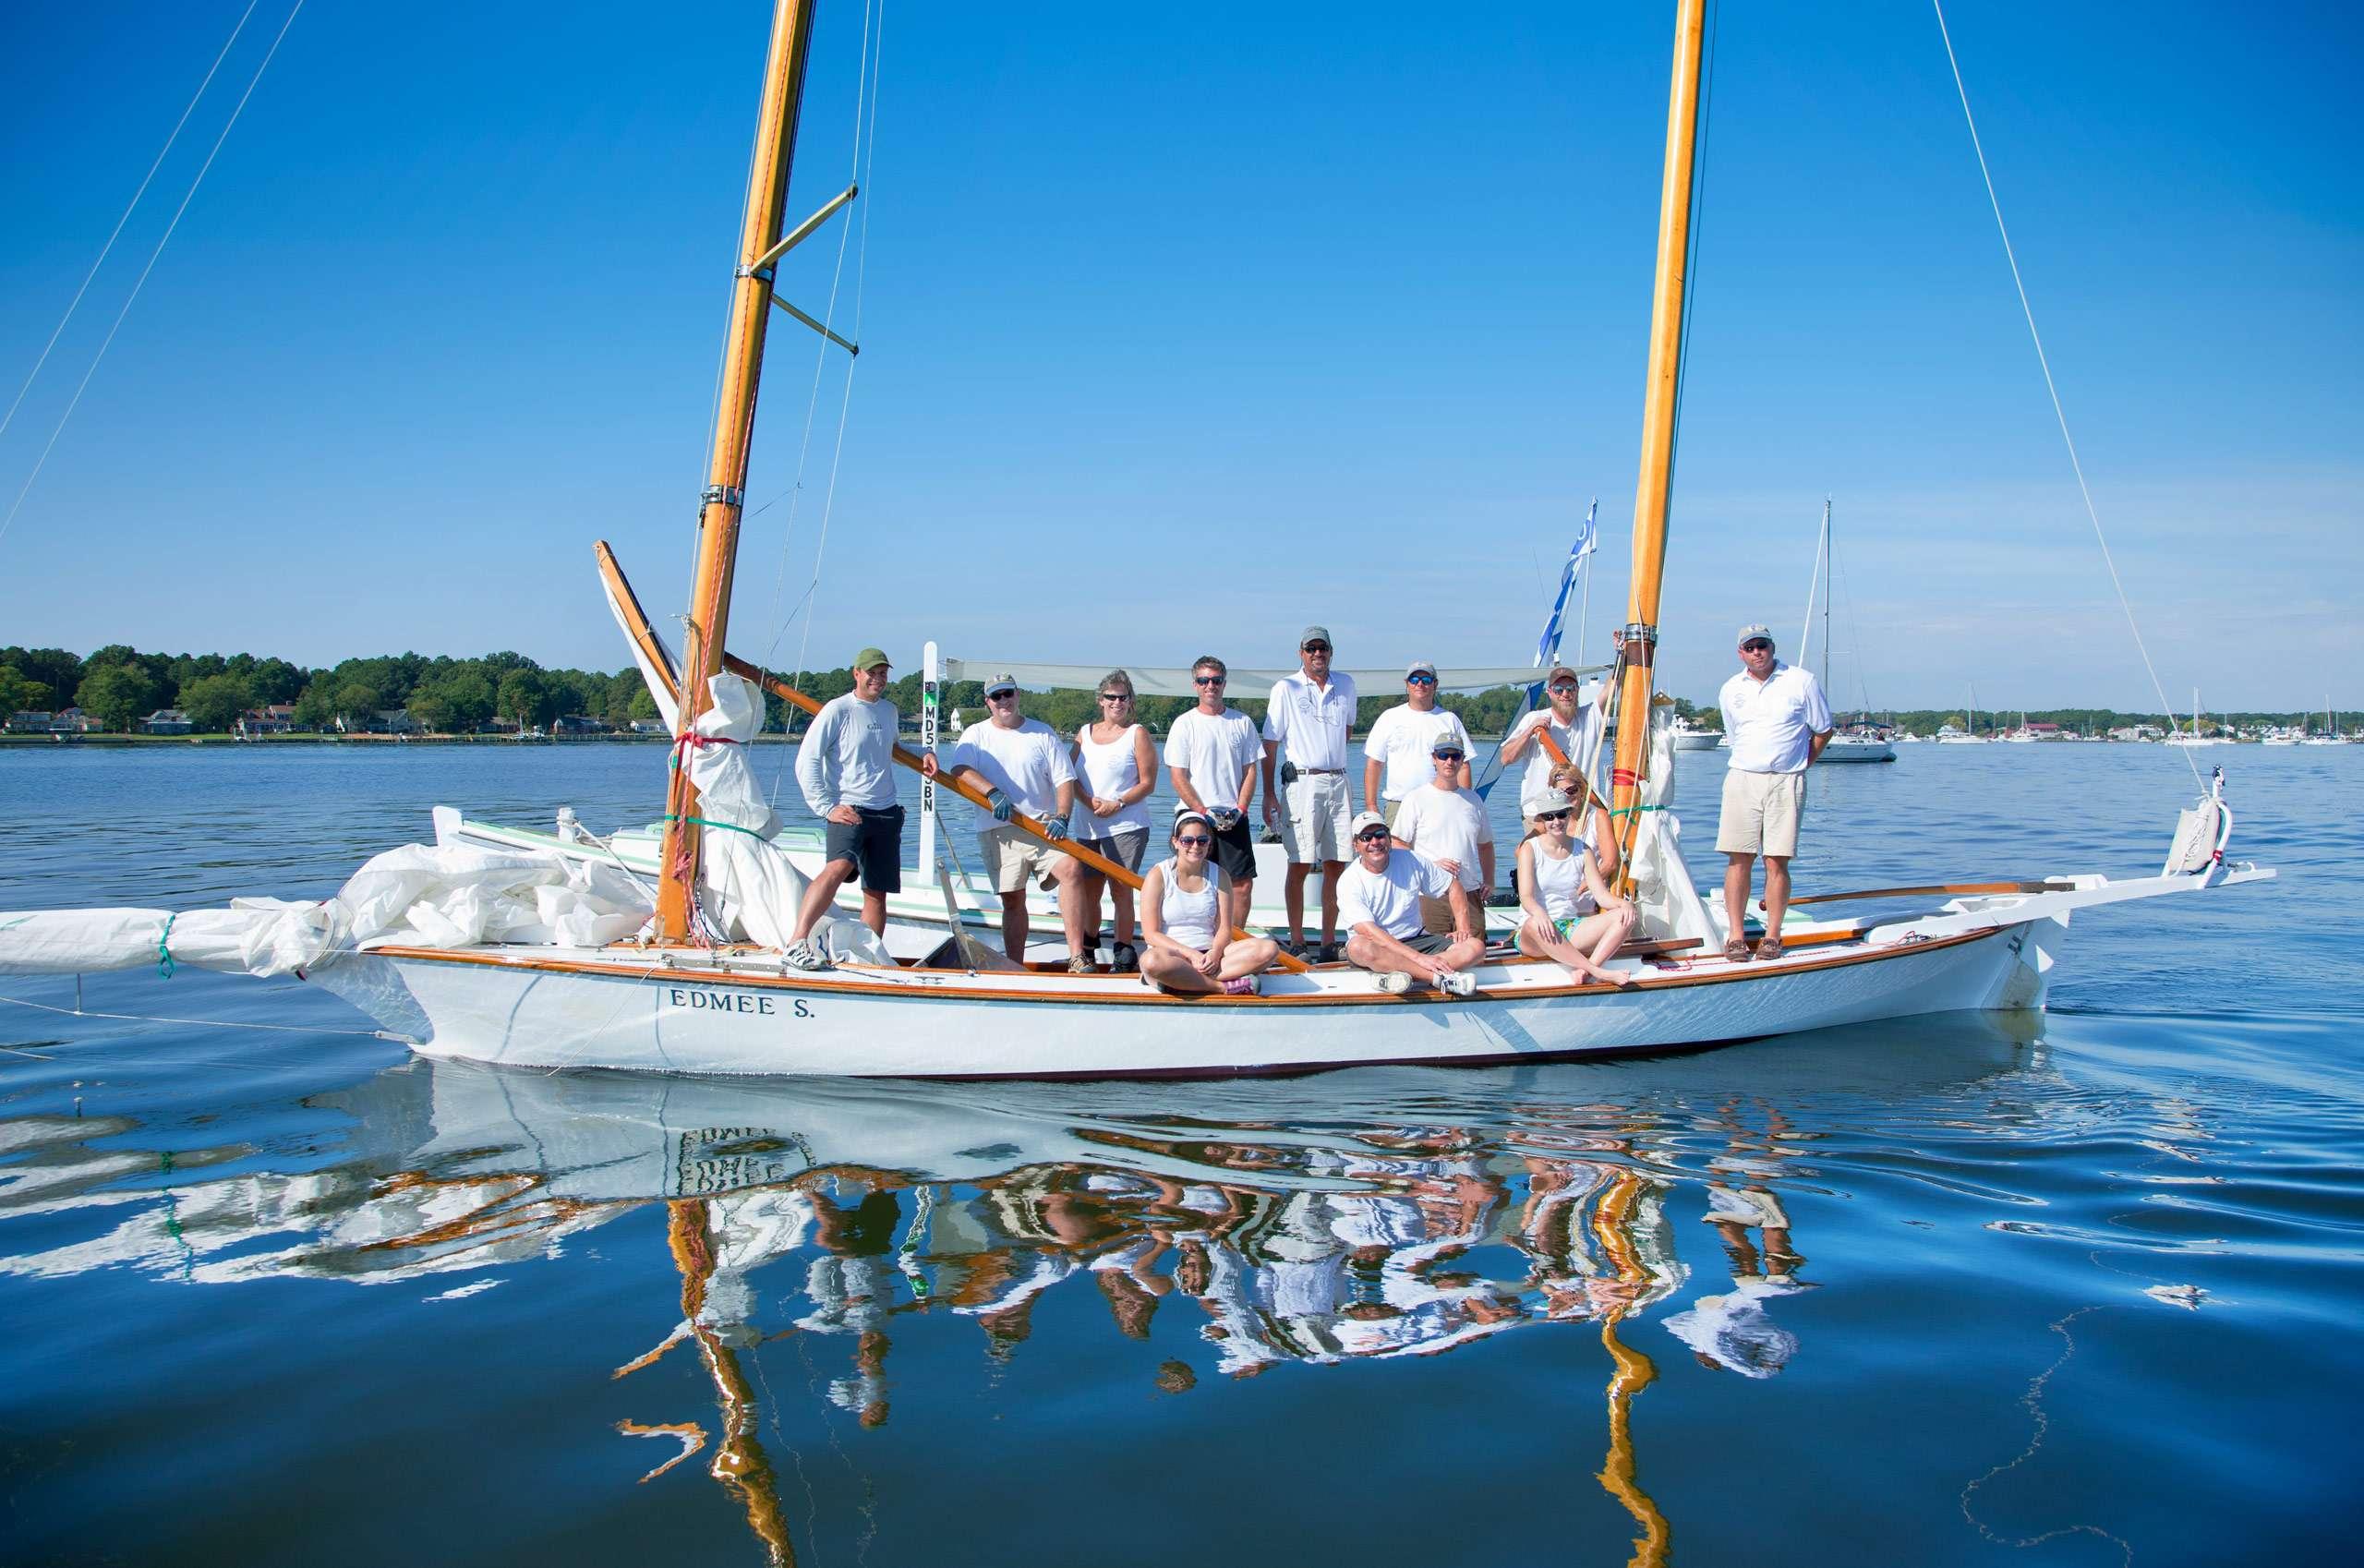 PORTFOLIO - People #19 and Sailing-Log Canoes  #30